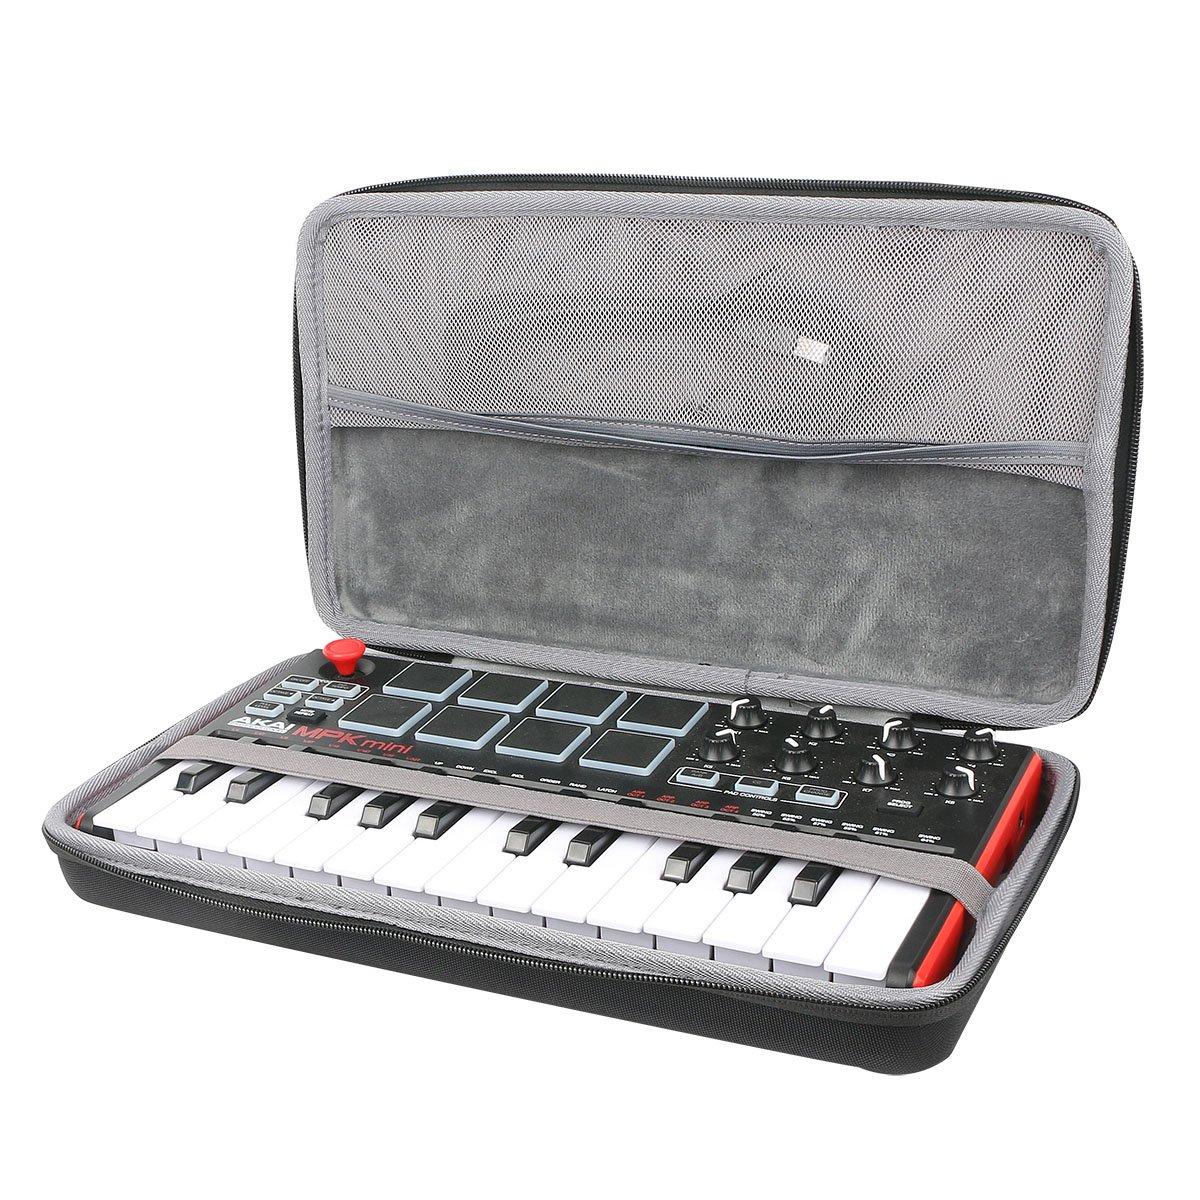 co2crea Hard Travel Case for Akai Professional MPK Mini MKII | 25-Key Ultra-Portable USB MIDI Drum Pad Keyboard Controller (Travel Case)